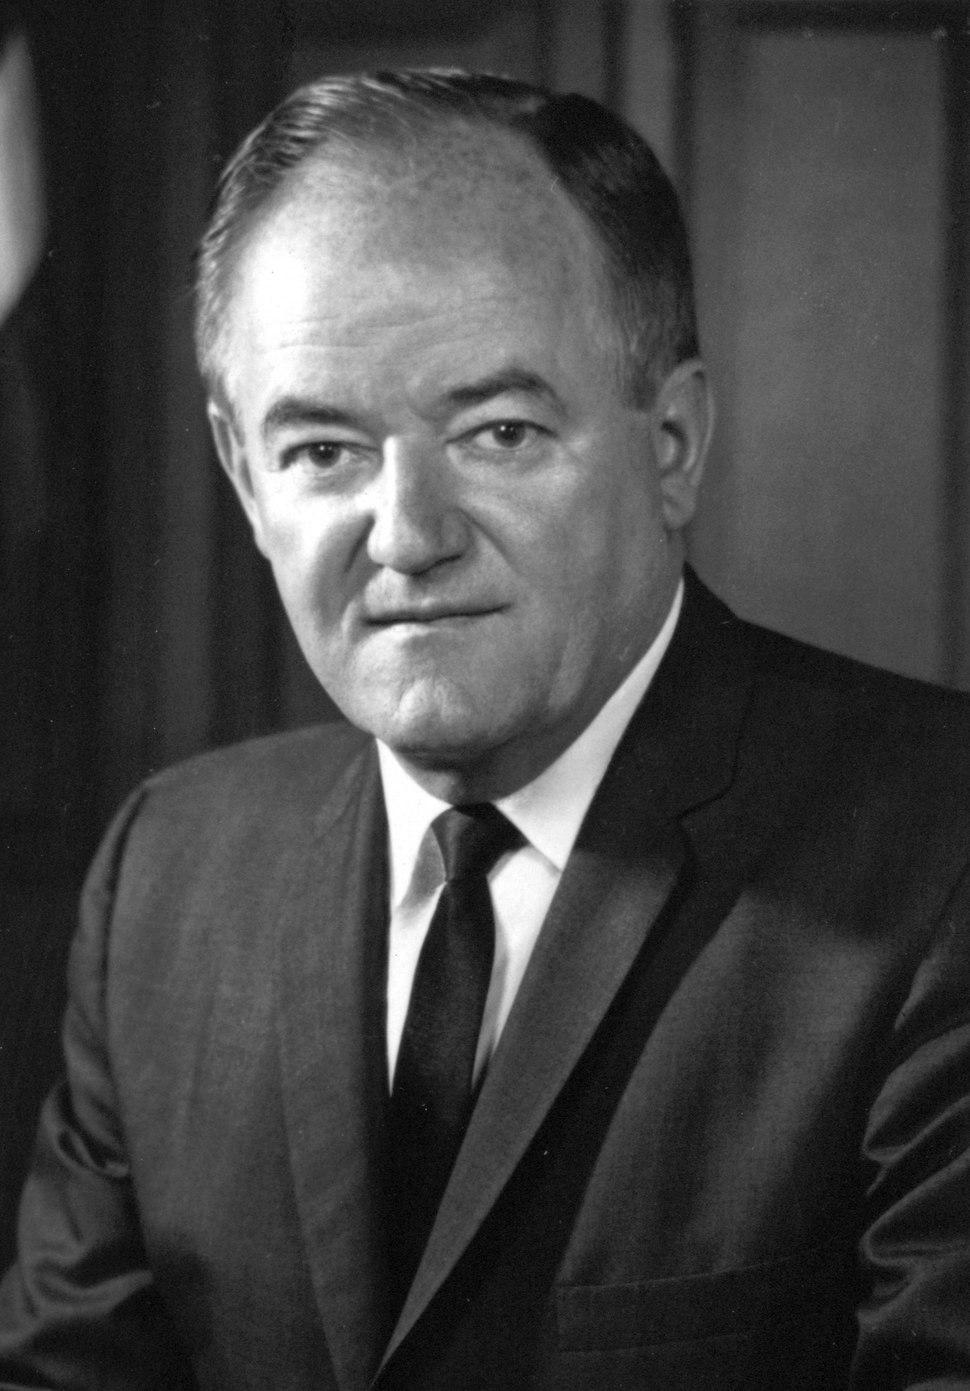 Hubert Humphrey, half-length portrait, facing front cropped